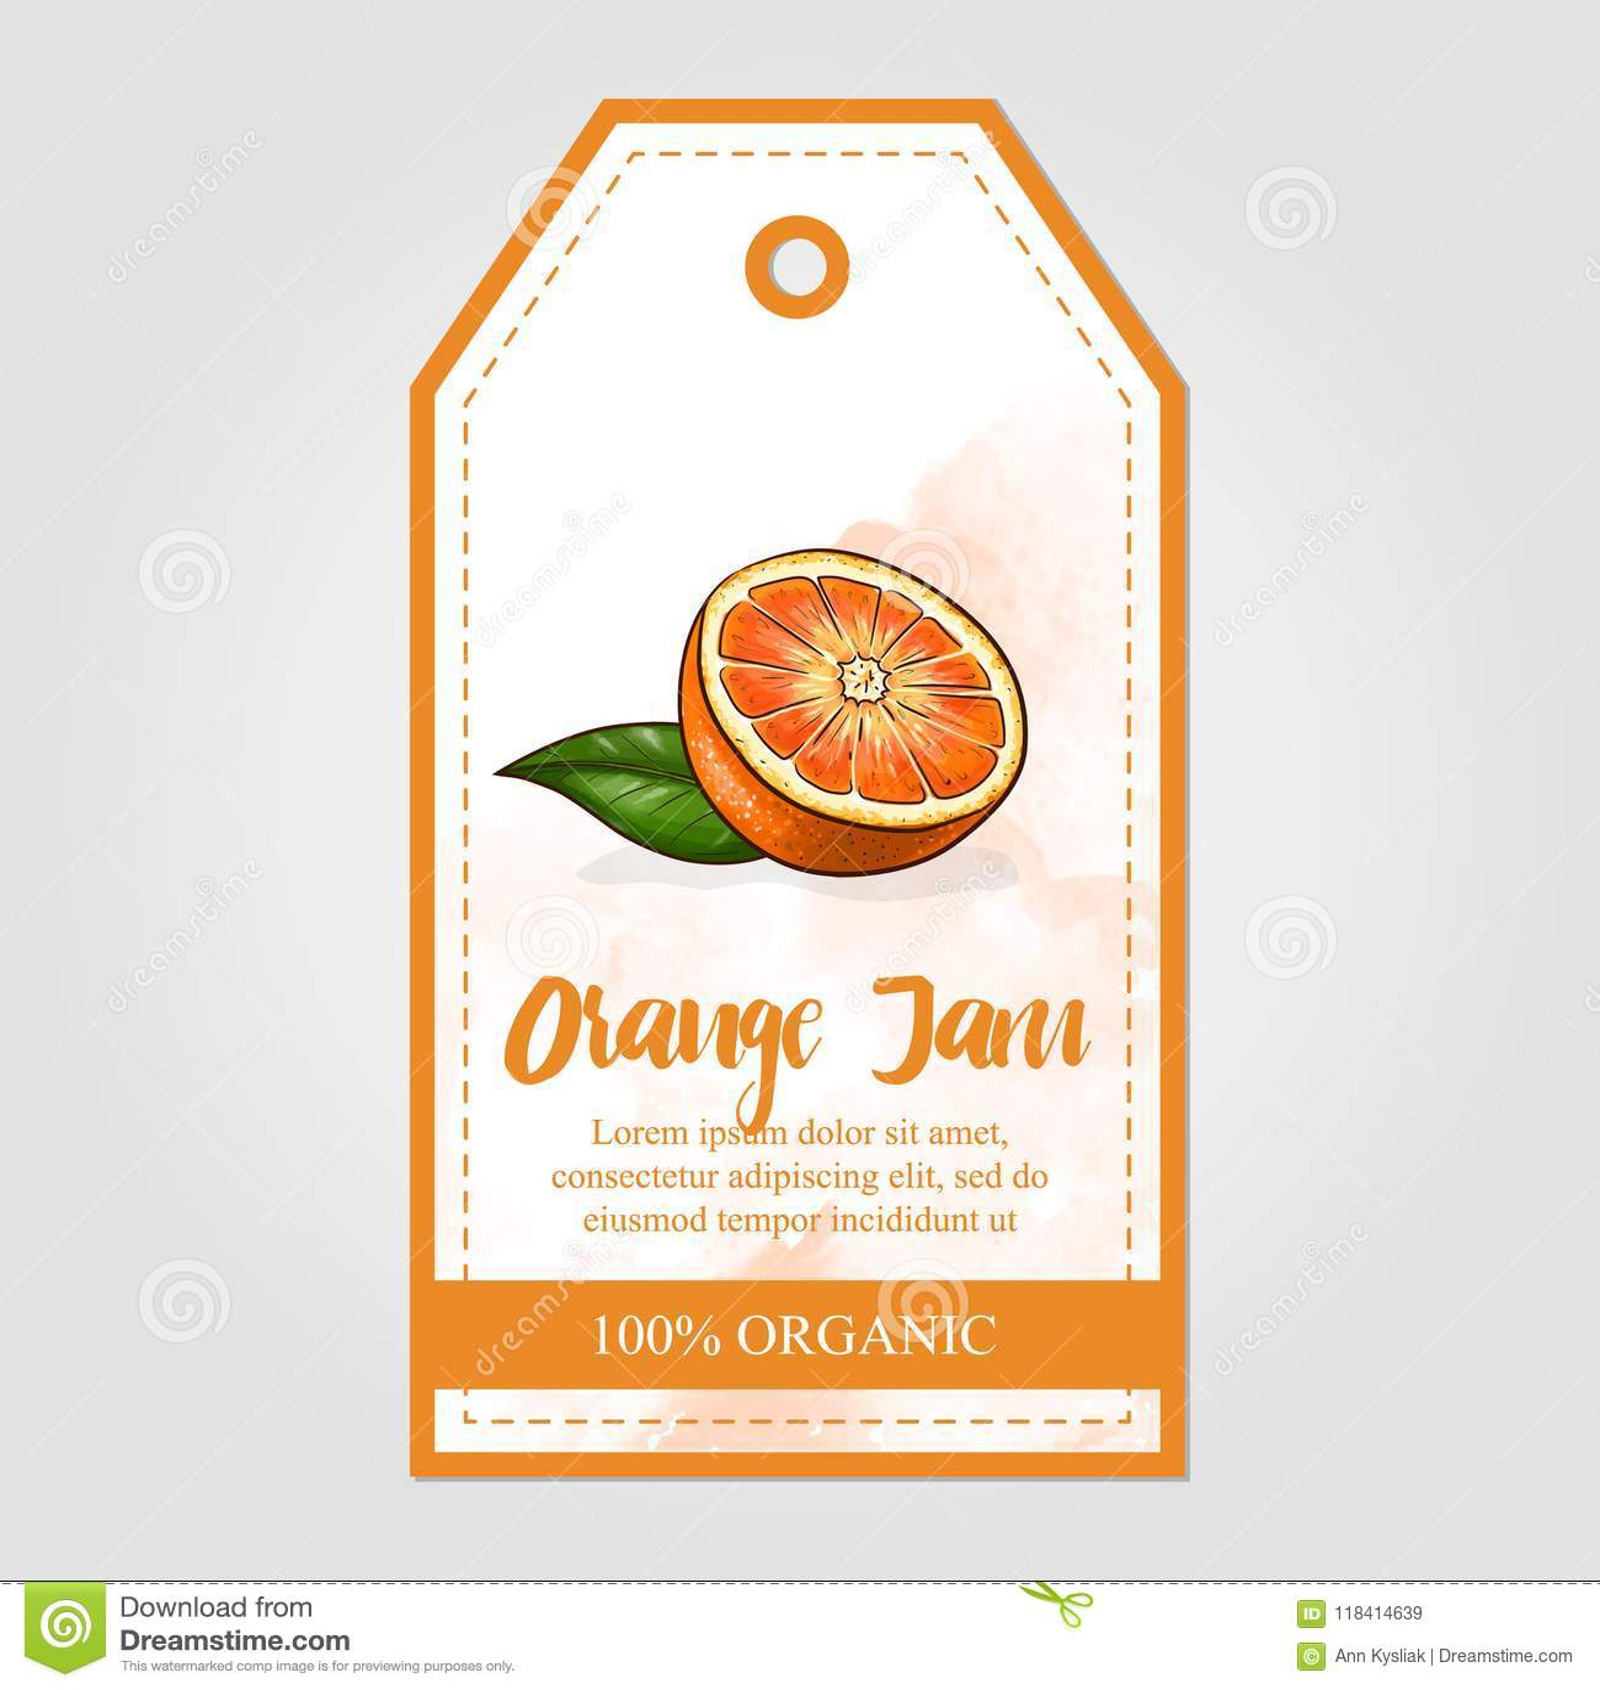 vector label of orange jam with watercolor background stock vector